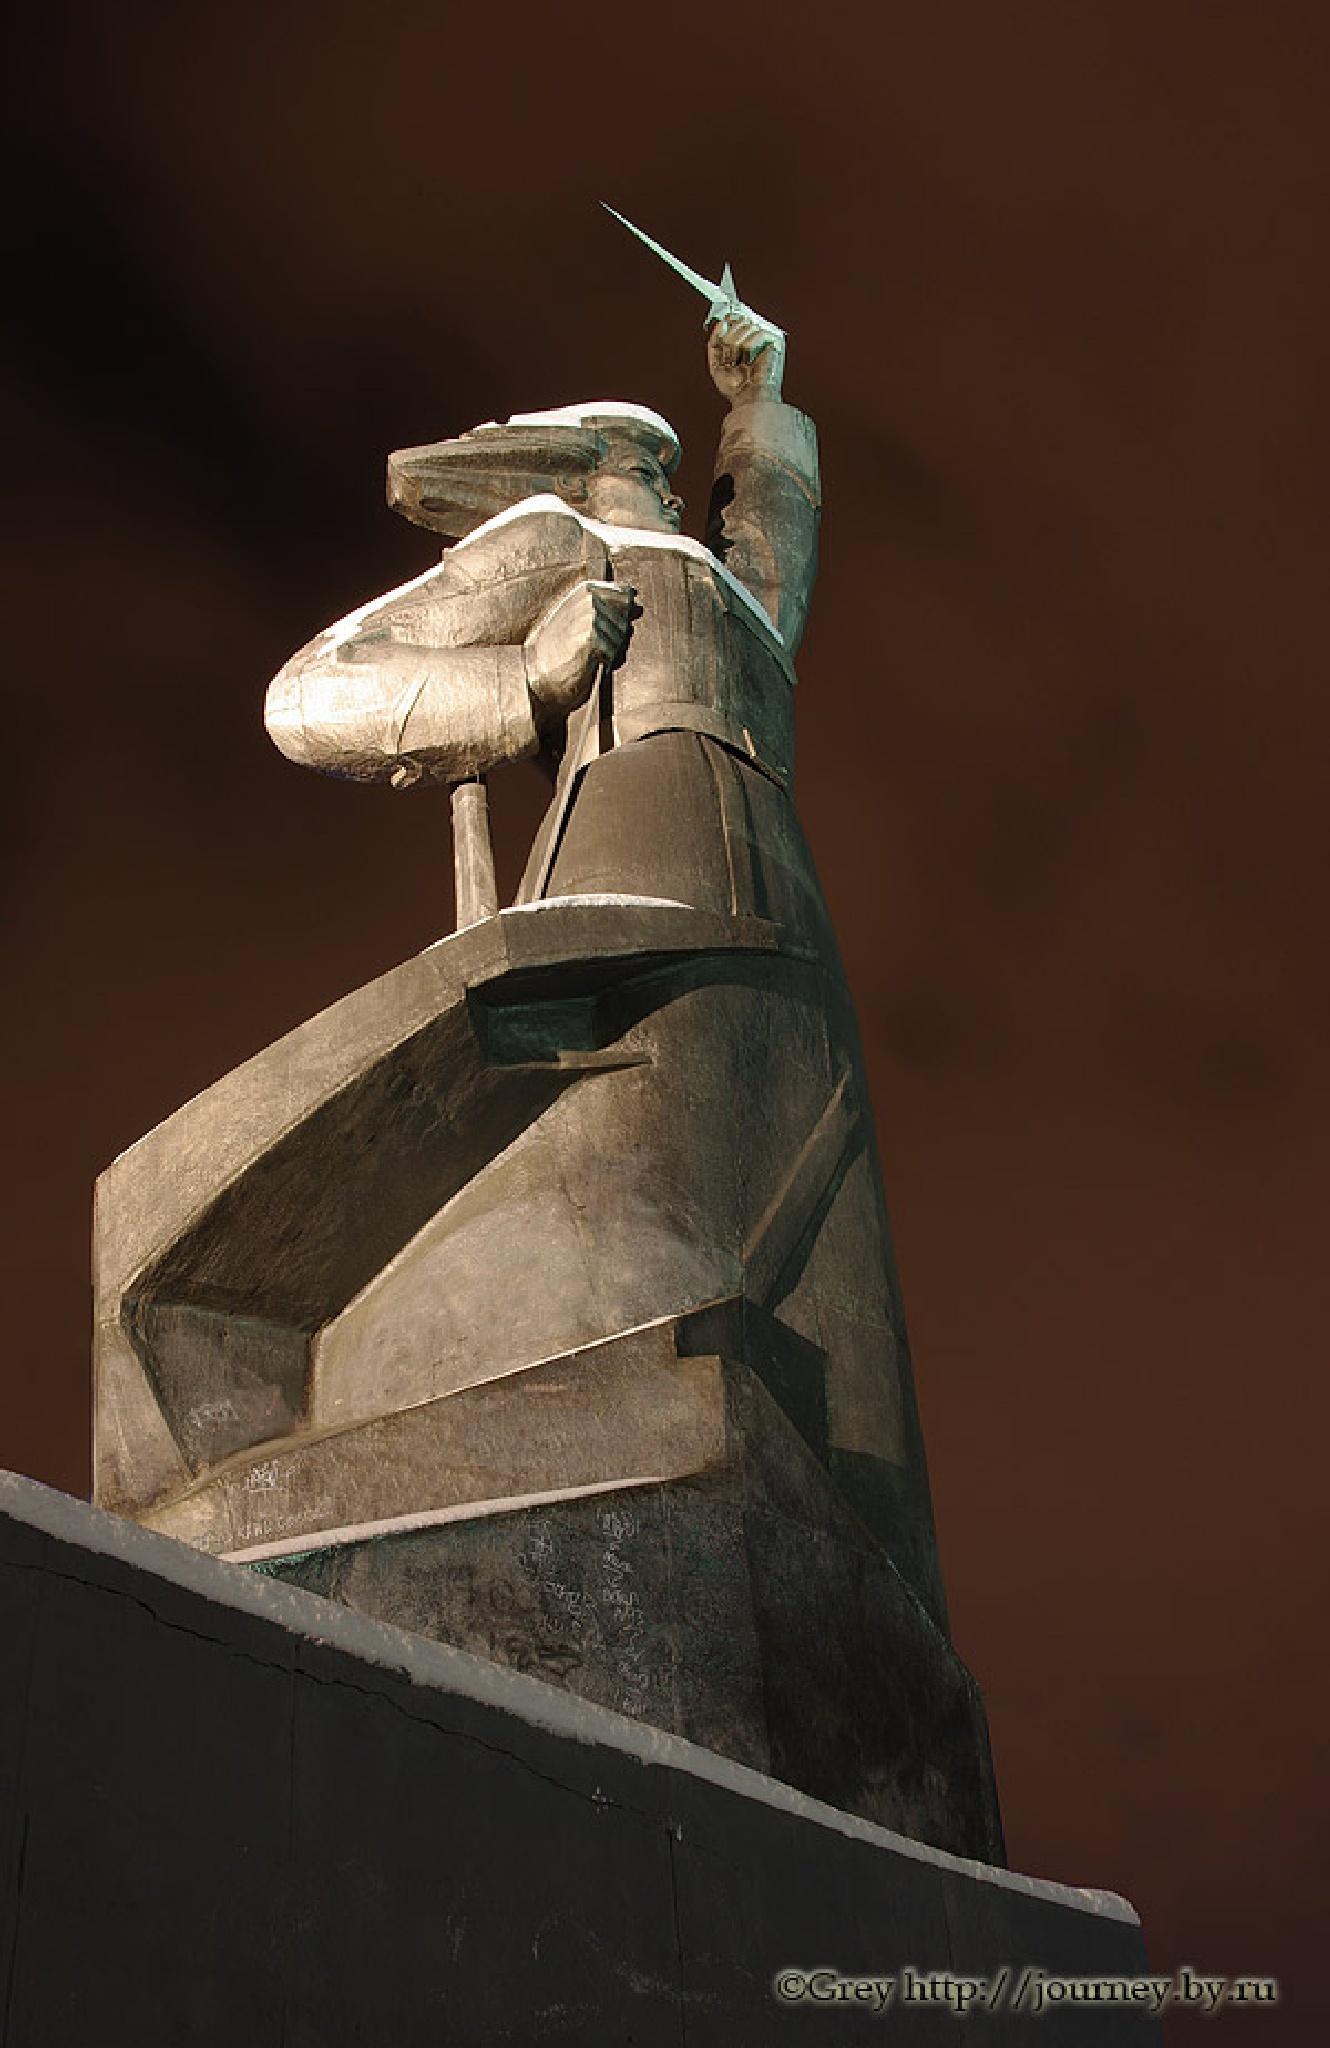 Monument by Sergey Pavlov